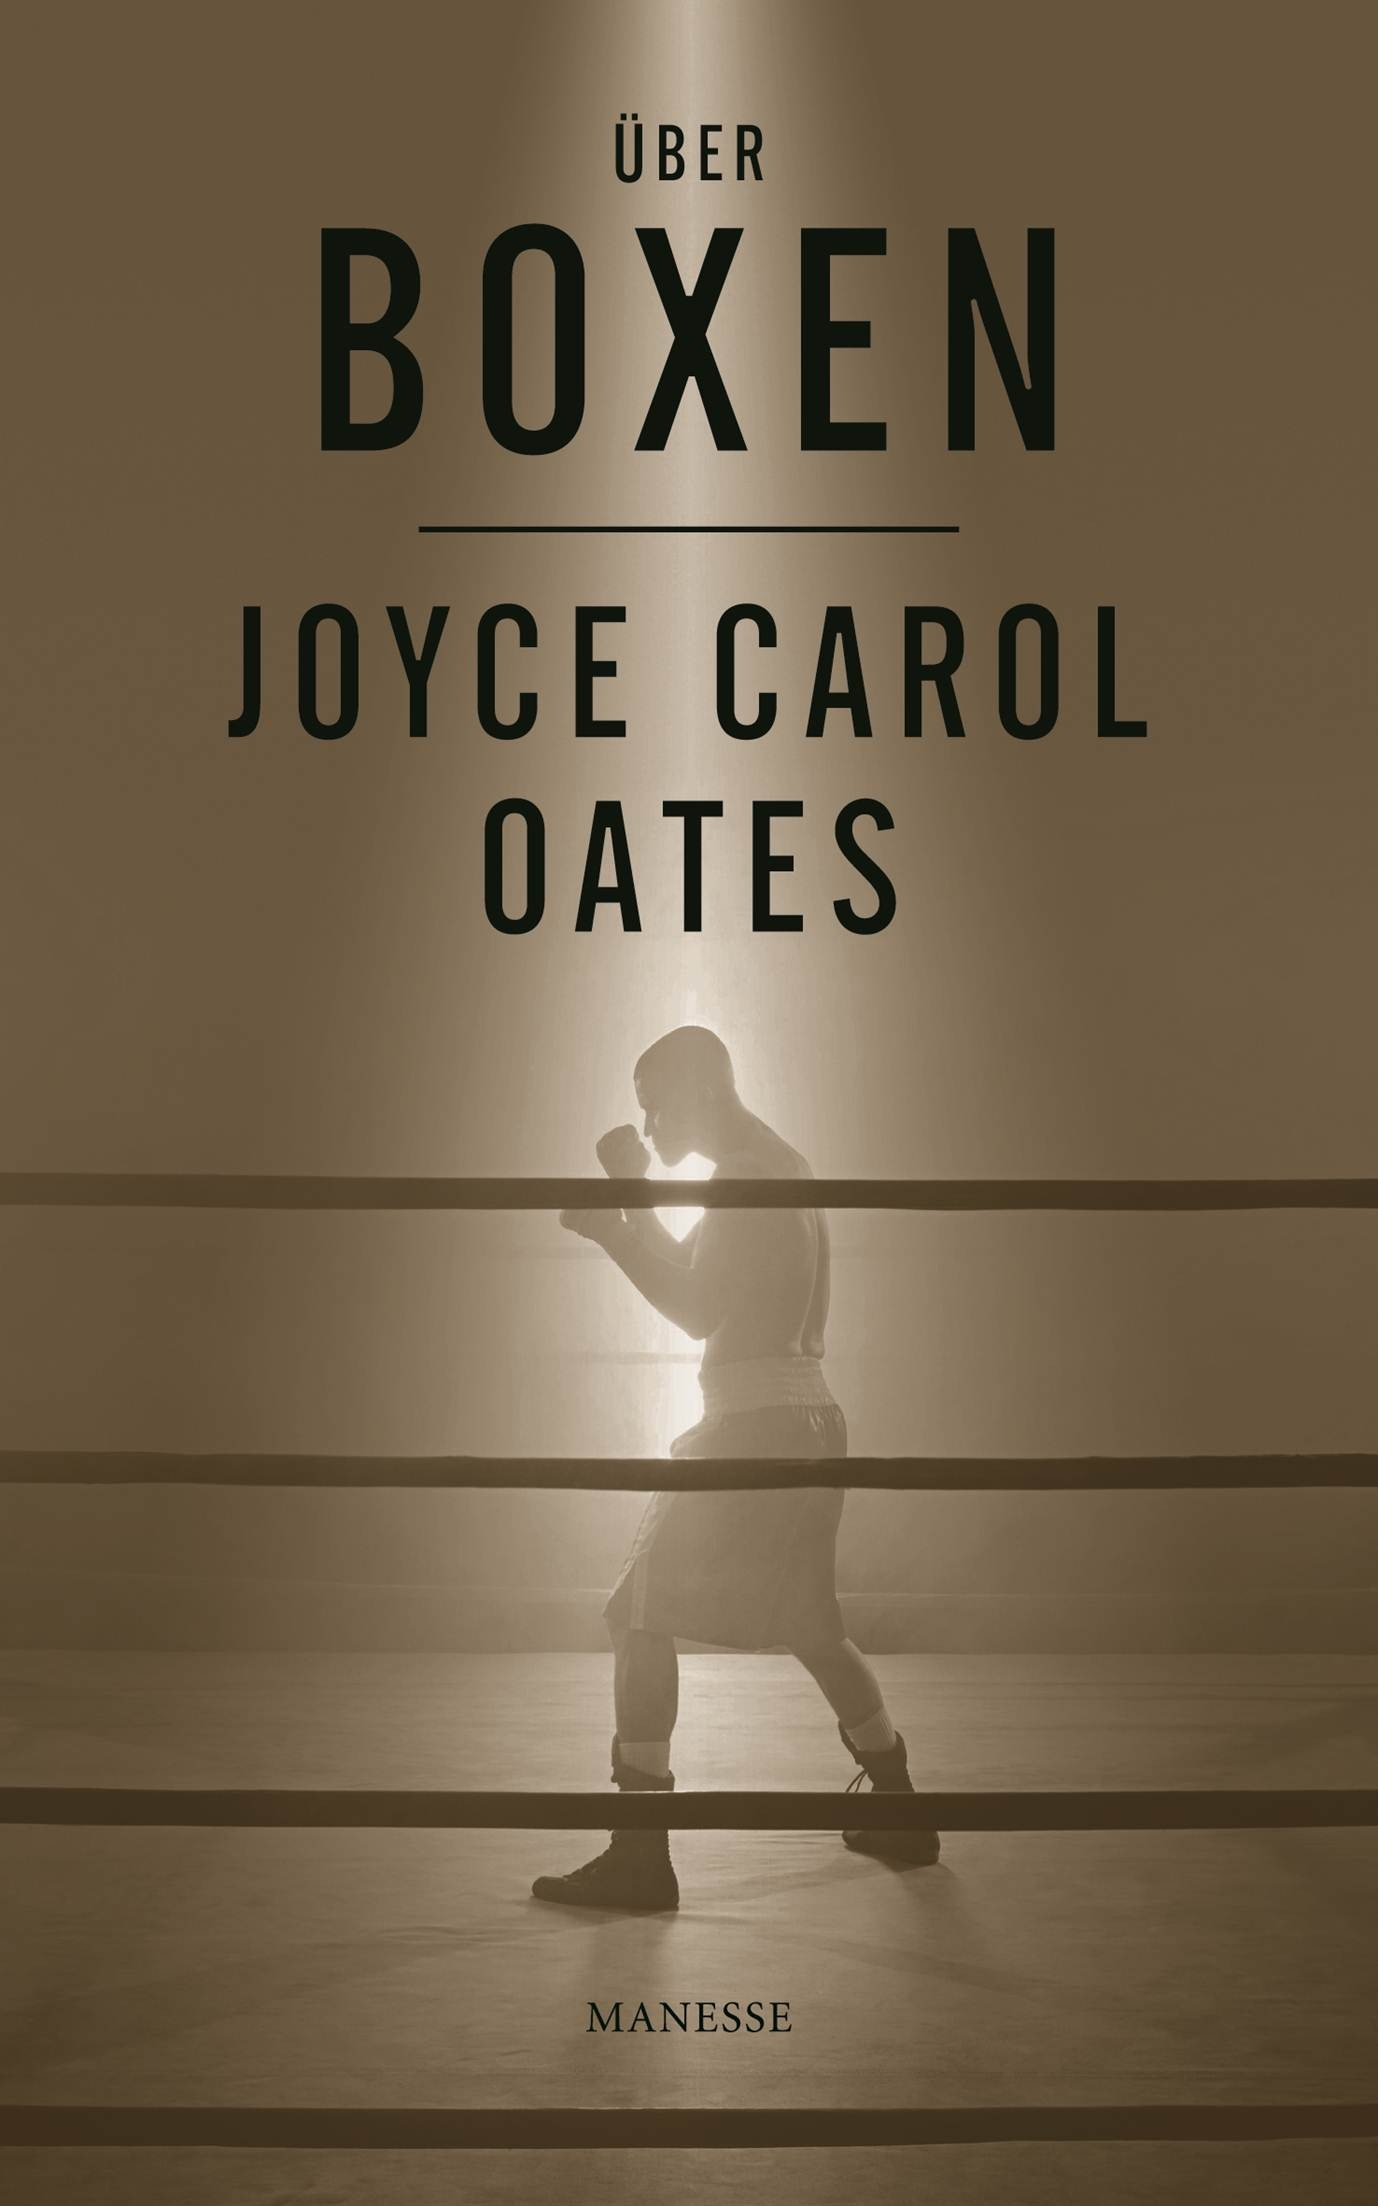 Über Boxen - Joyce Carol Oates